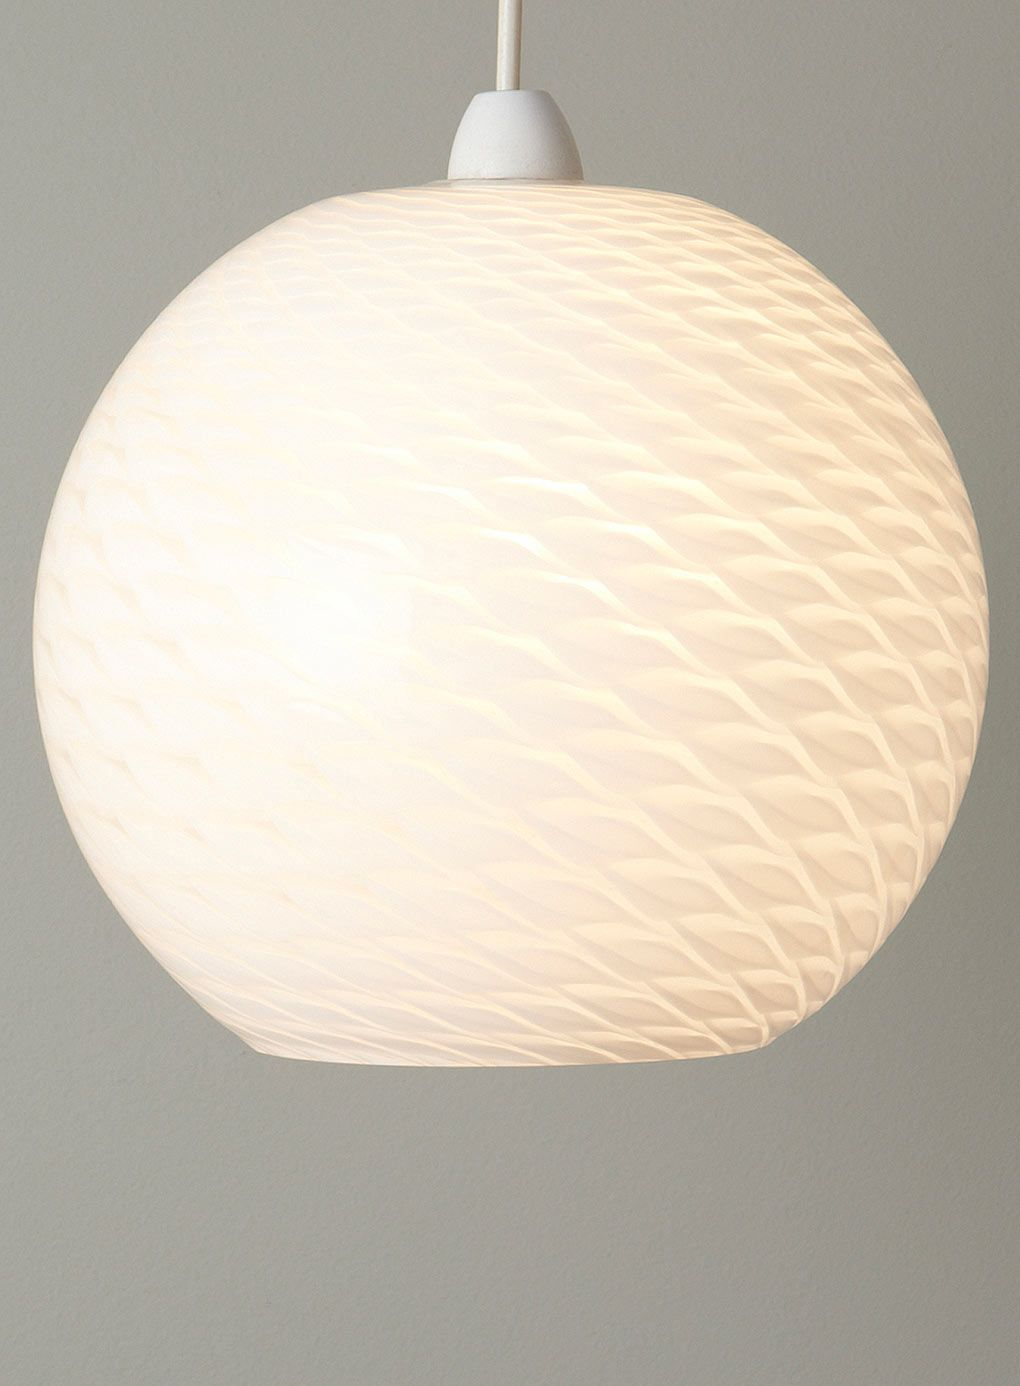 Opal Swirl Easyfit Pendant Lighting For The Home Bhs Ceiling Lights Hanging Lights